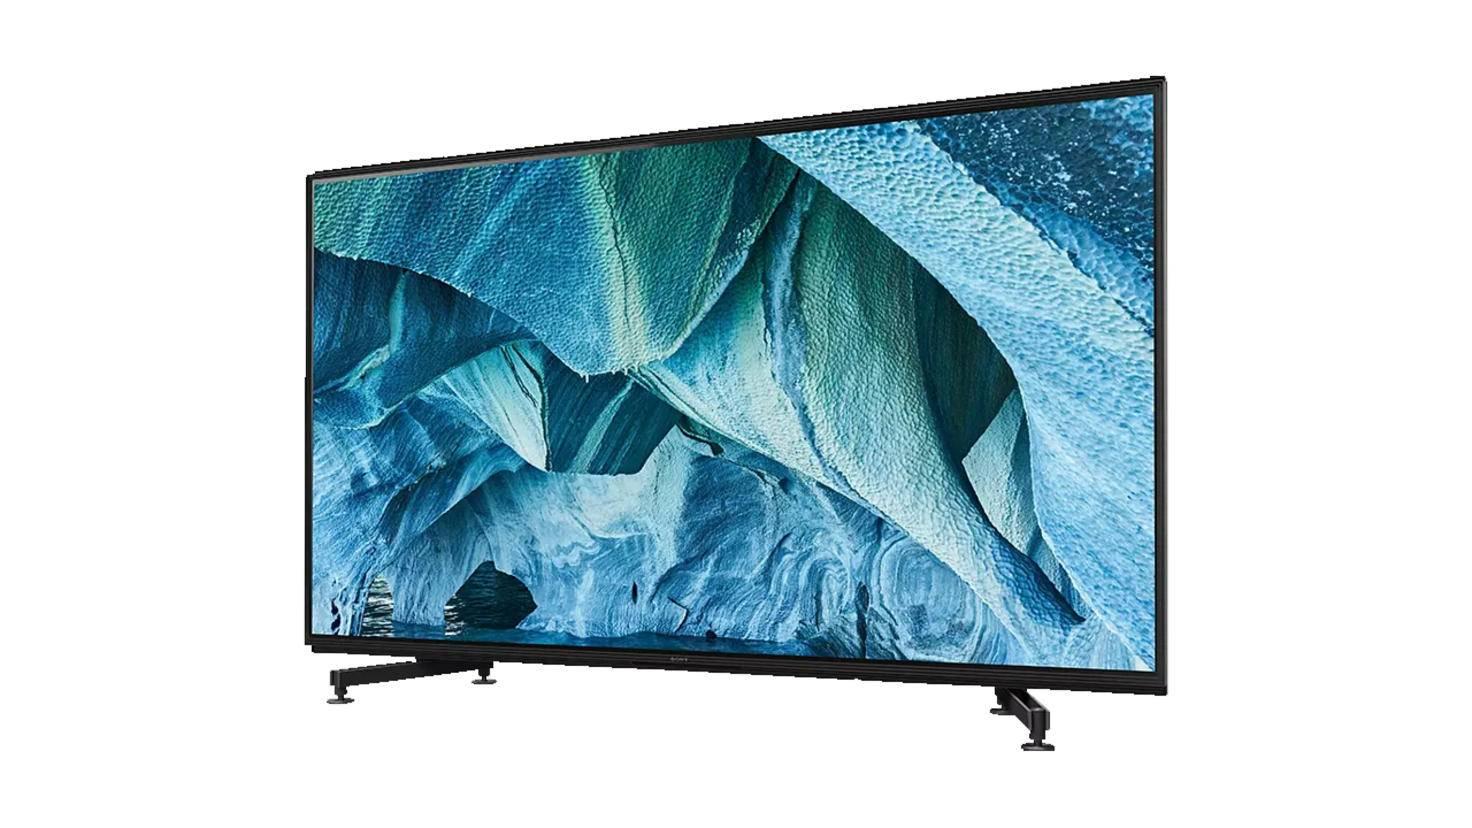 Sony KD-85ZG9 8K TV 85 inches